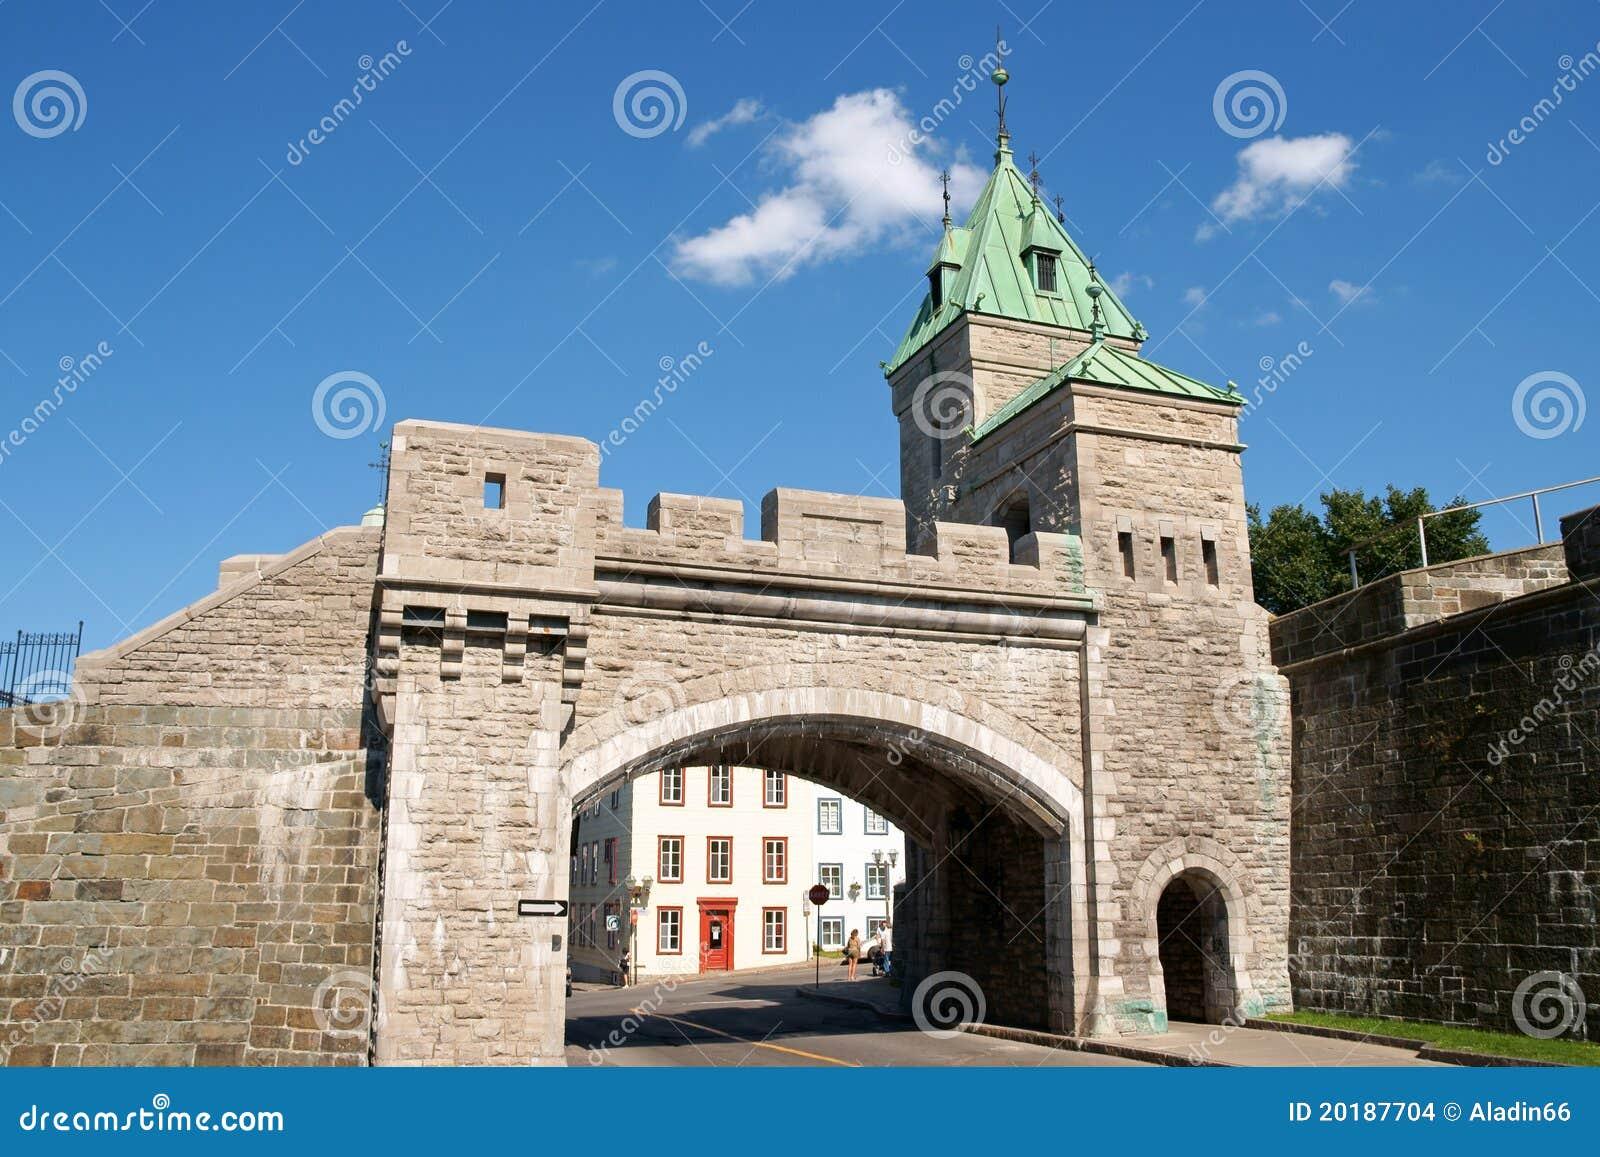 Porte saint louis city gate quebec city stock images for Porte quebec